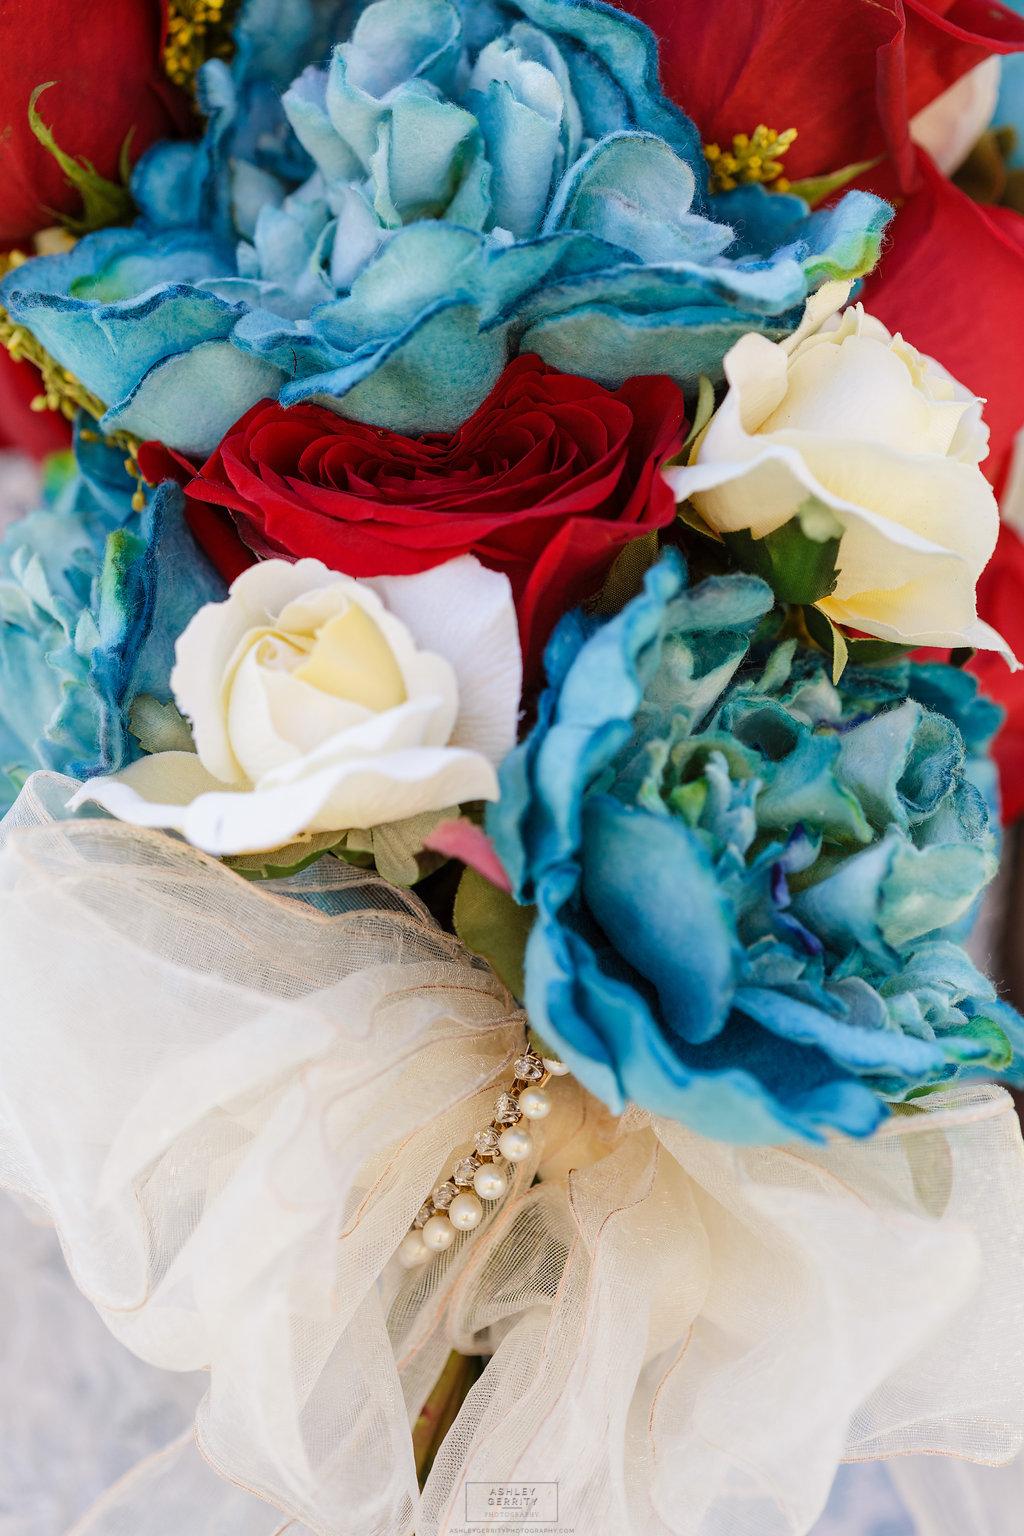 24 Felt Flower Fresh Flower Bouquet Heirloom Jewelry Gilmore Girls Wedding Inspiration.jpg